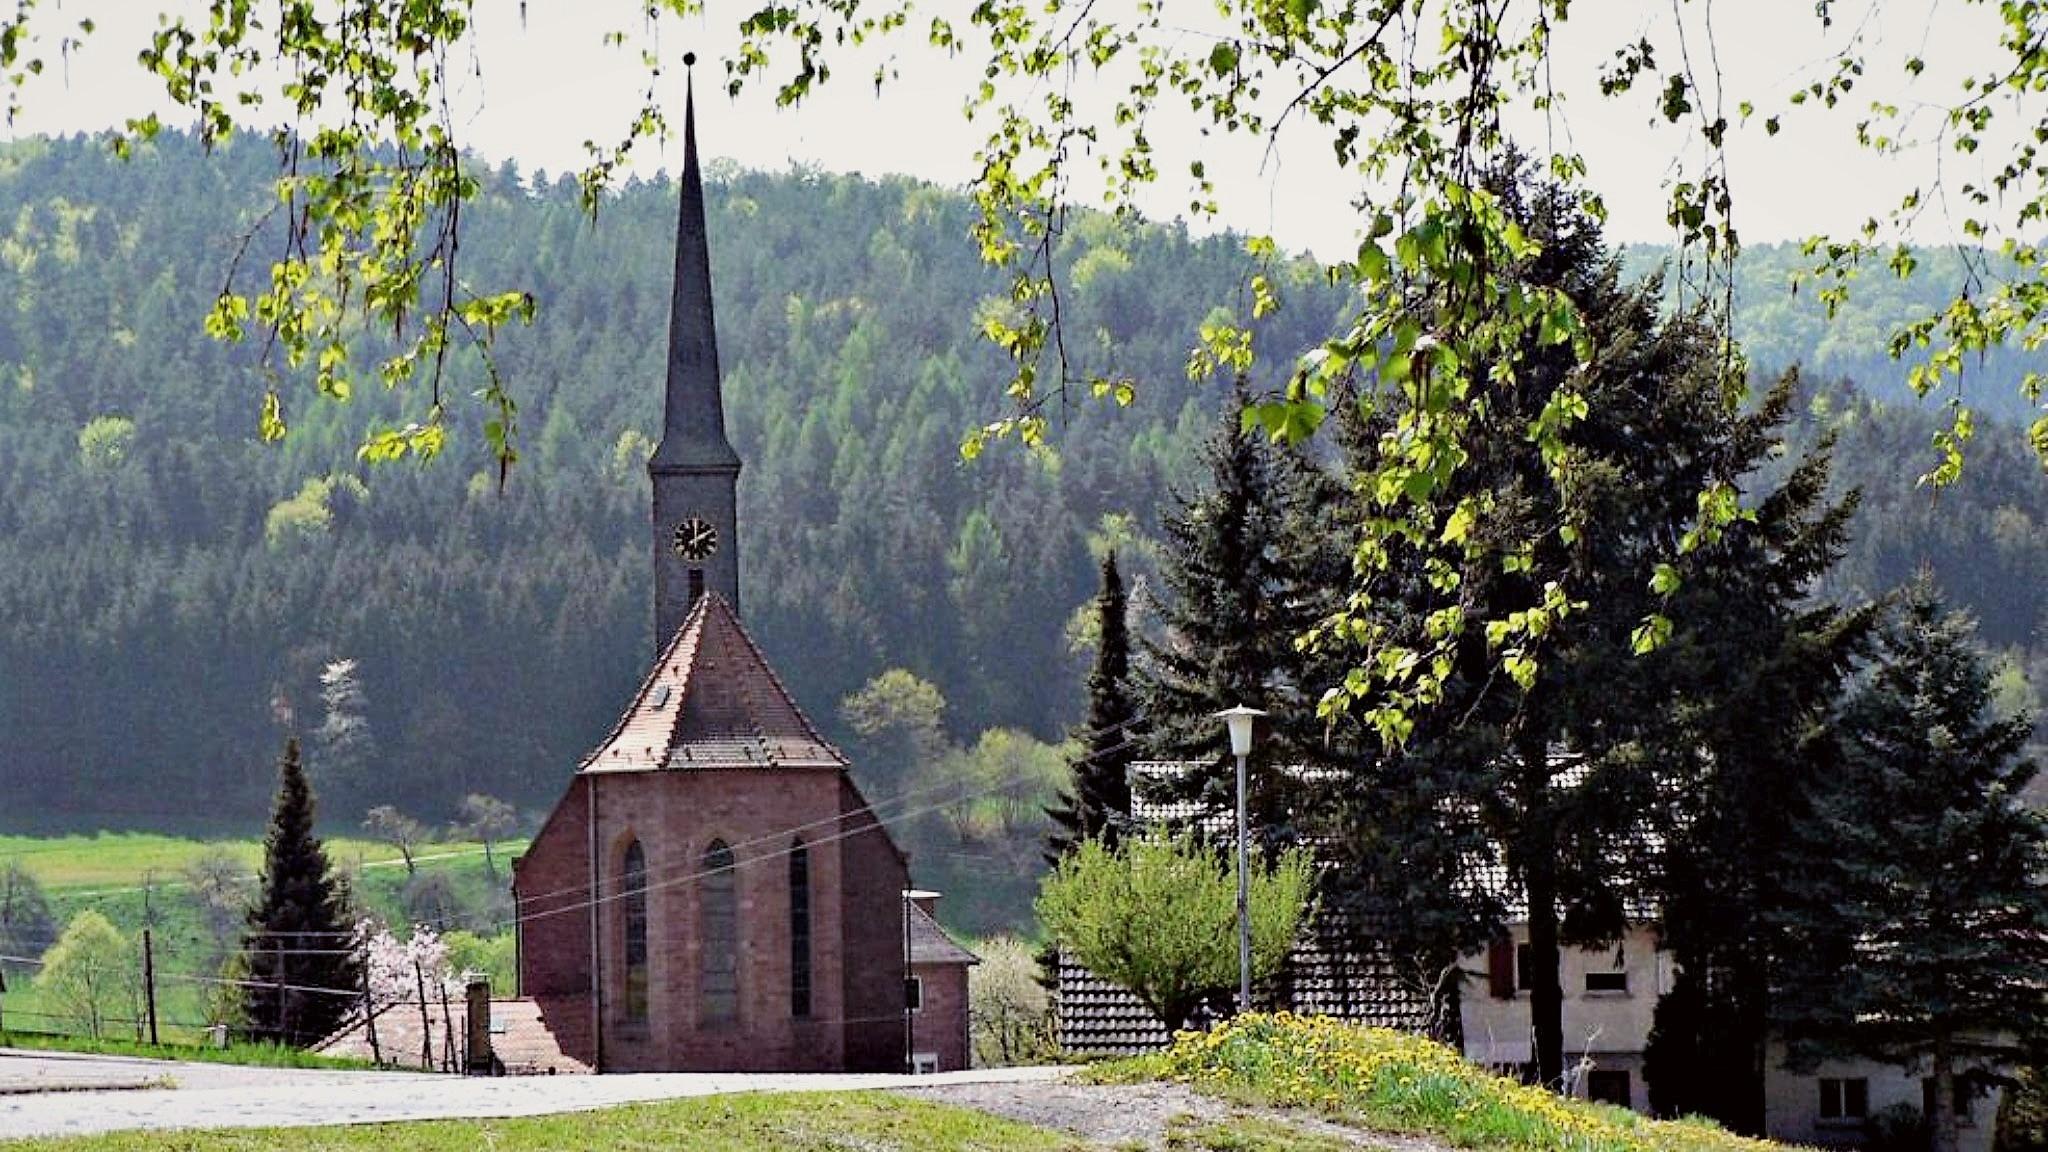 Sonnenstraße Blick auf Kirche